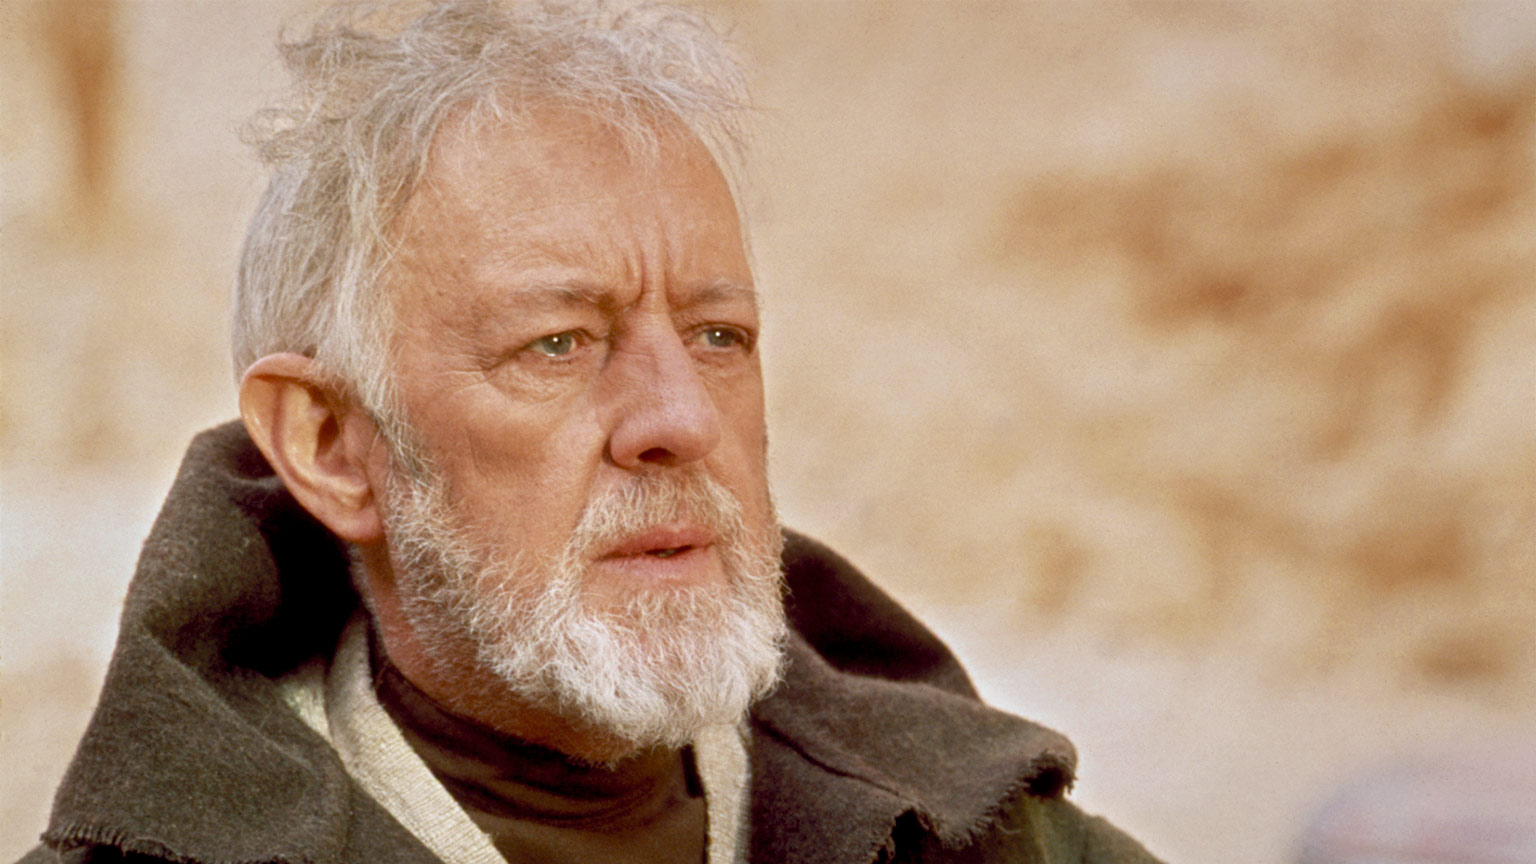 https://i0.wp.com/img.lum.dolimg.com/v1/images/Obi-Wan-Kenobi_6d775533.jpeg